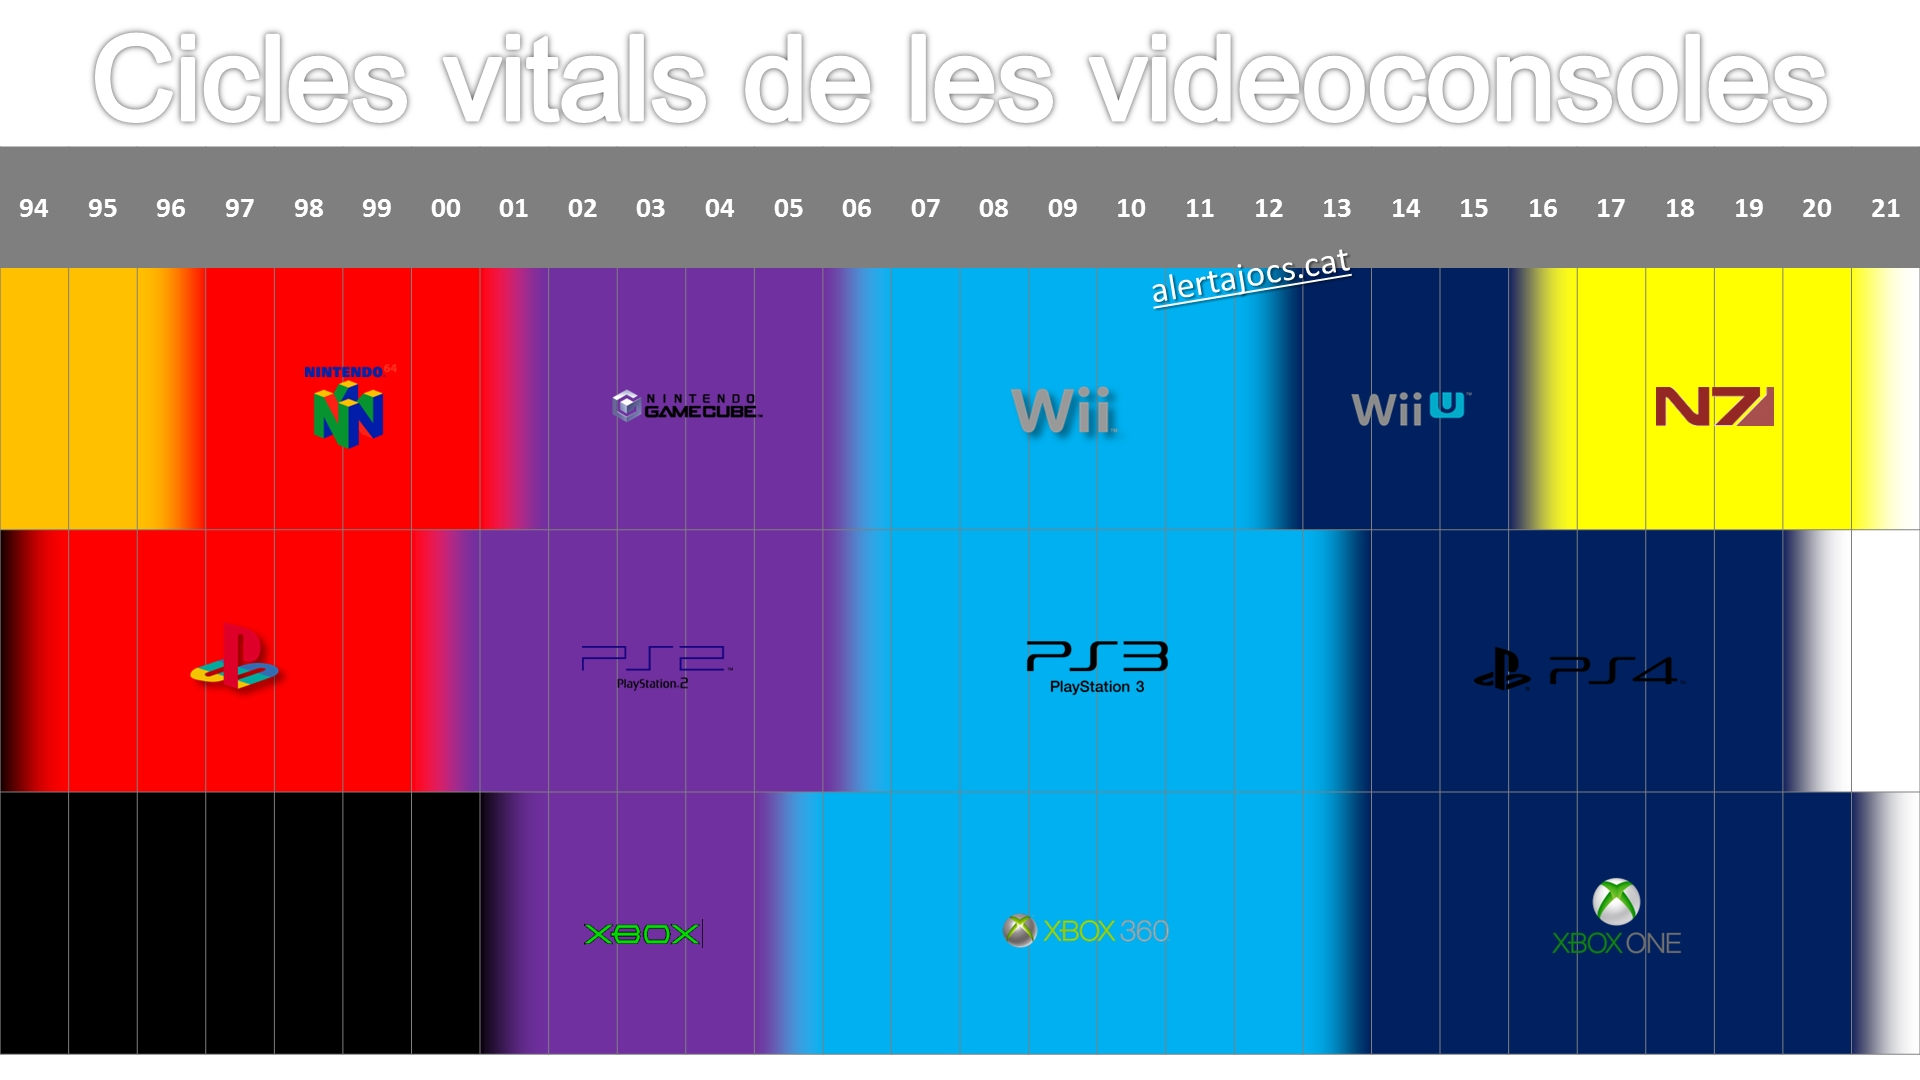 cicle vital videoconsoles 01